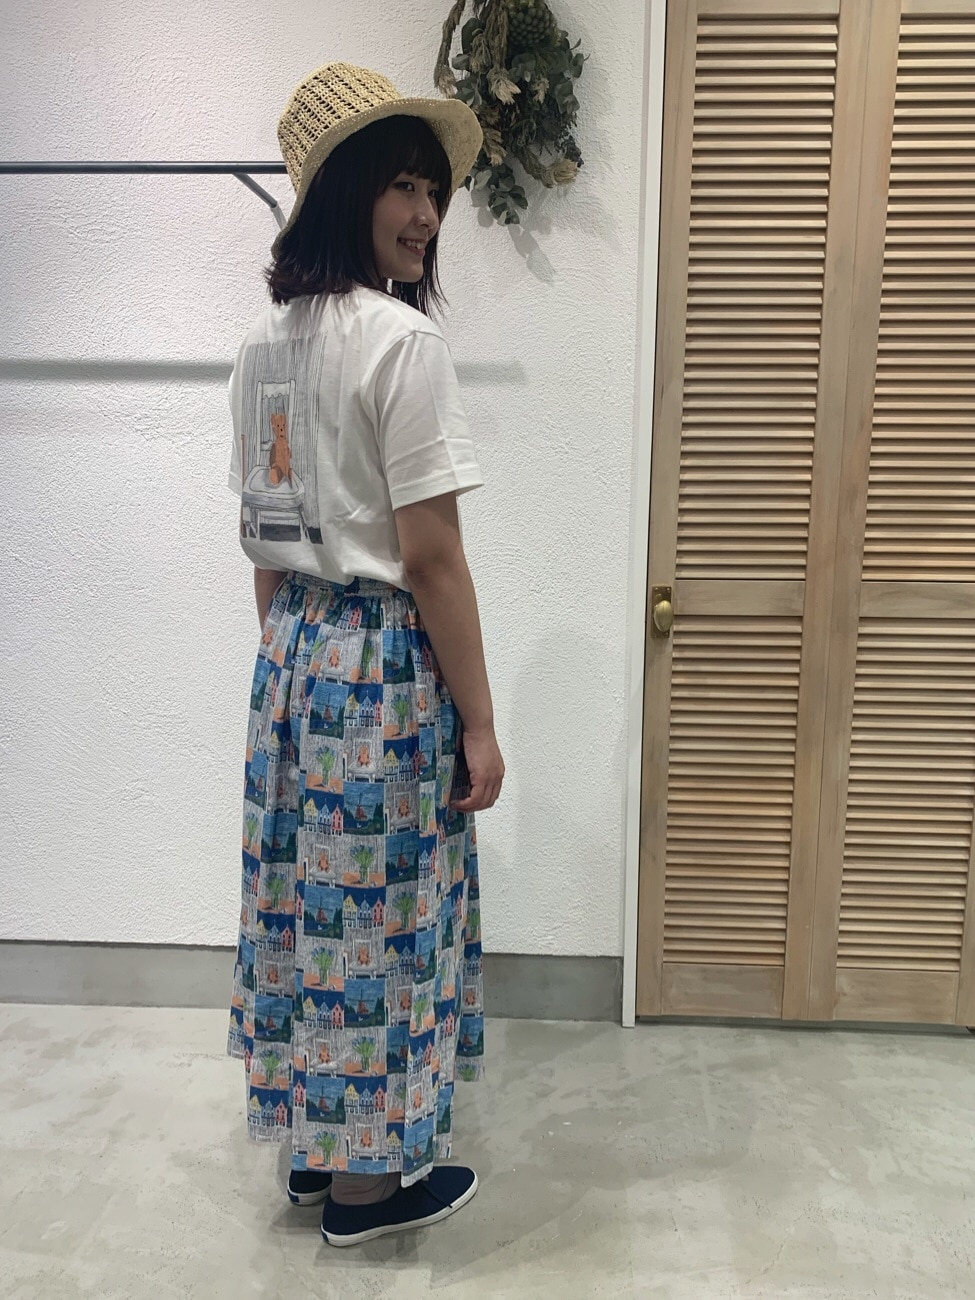 chambre de charme 横浜ジョイナス 身長:162cm 2020.06.06